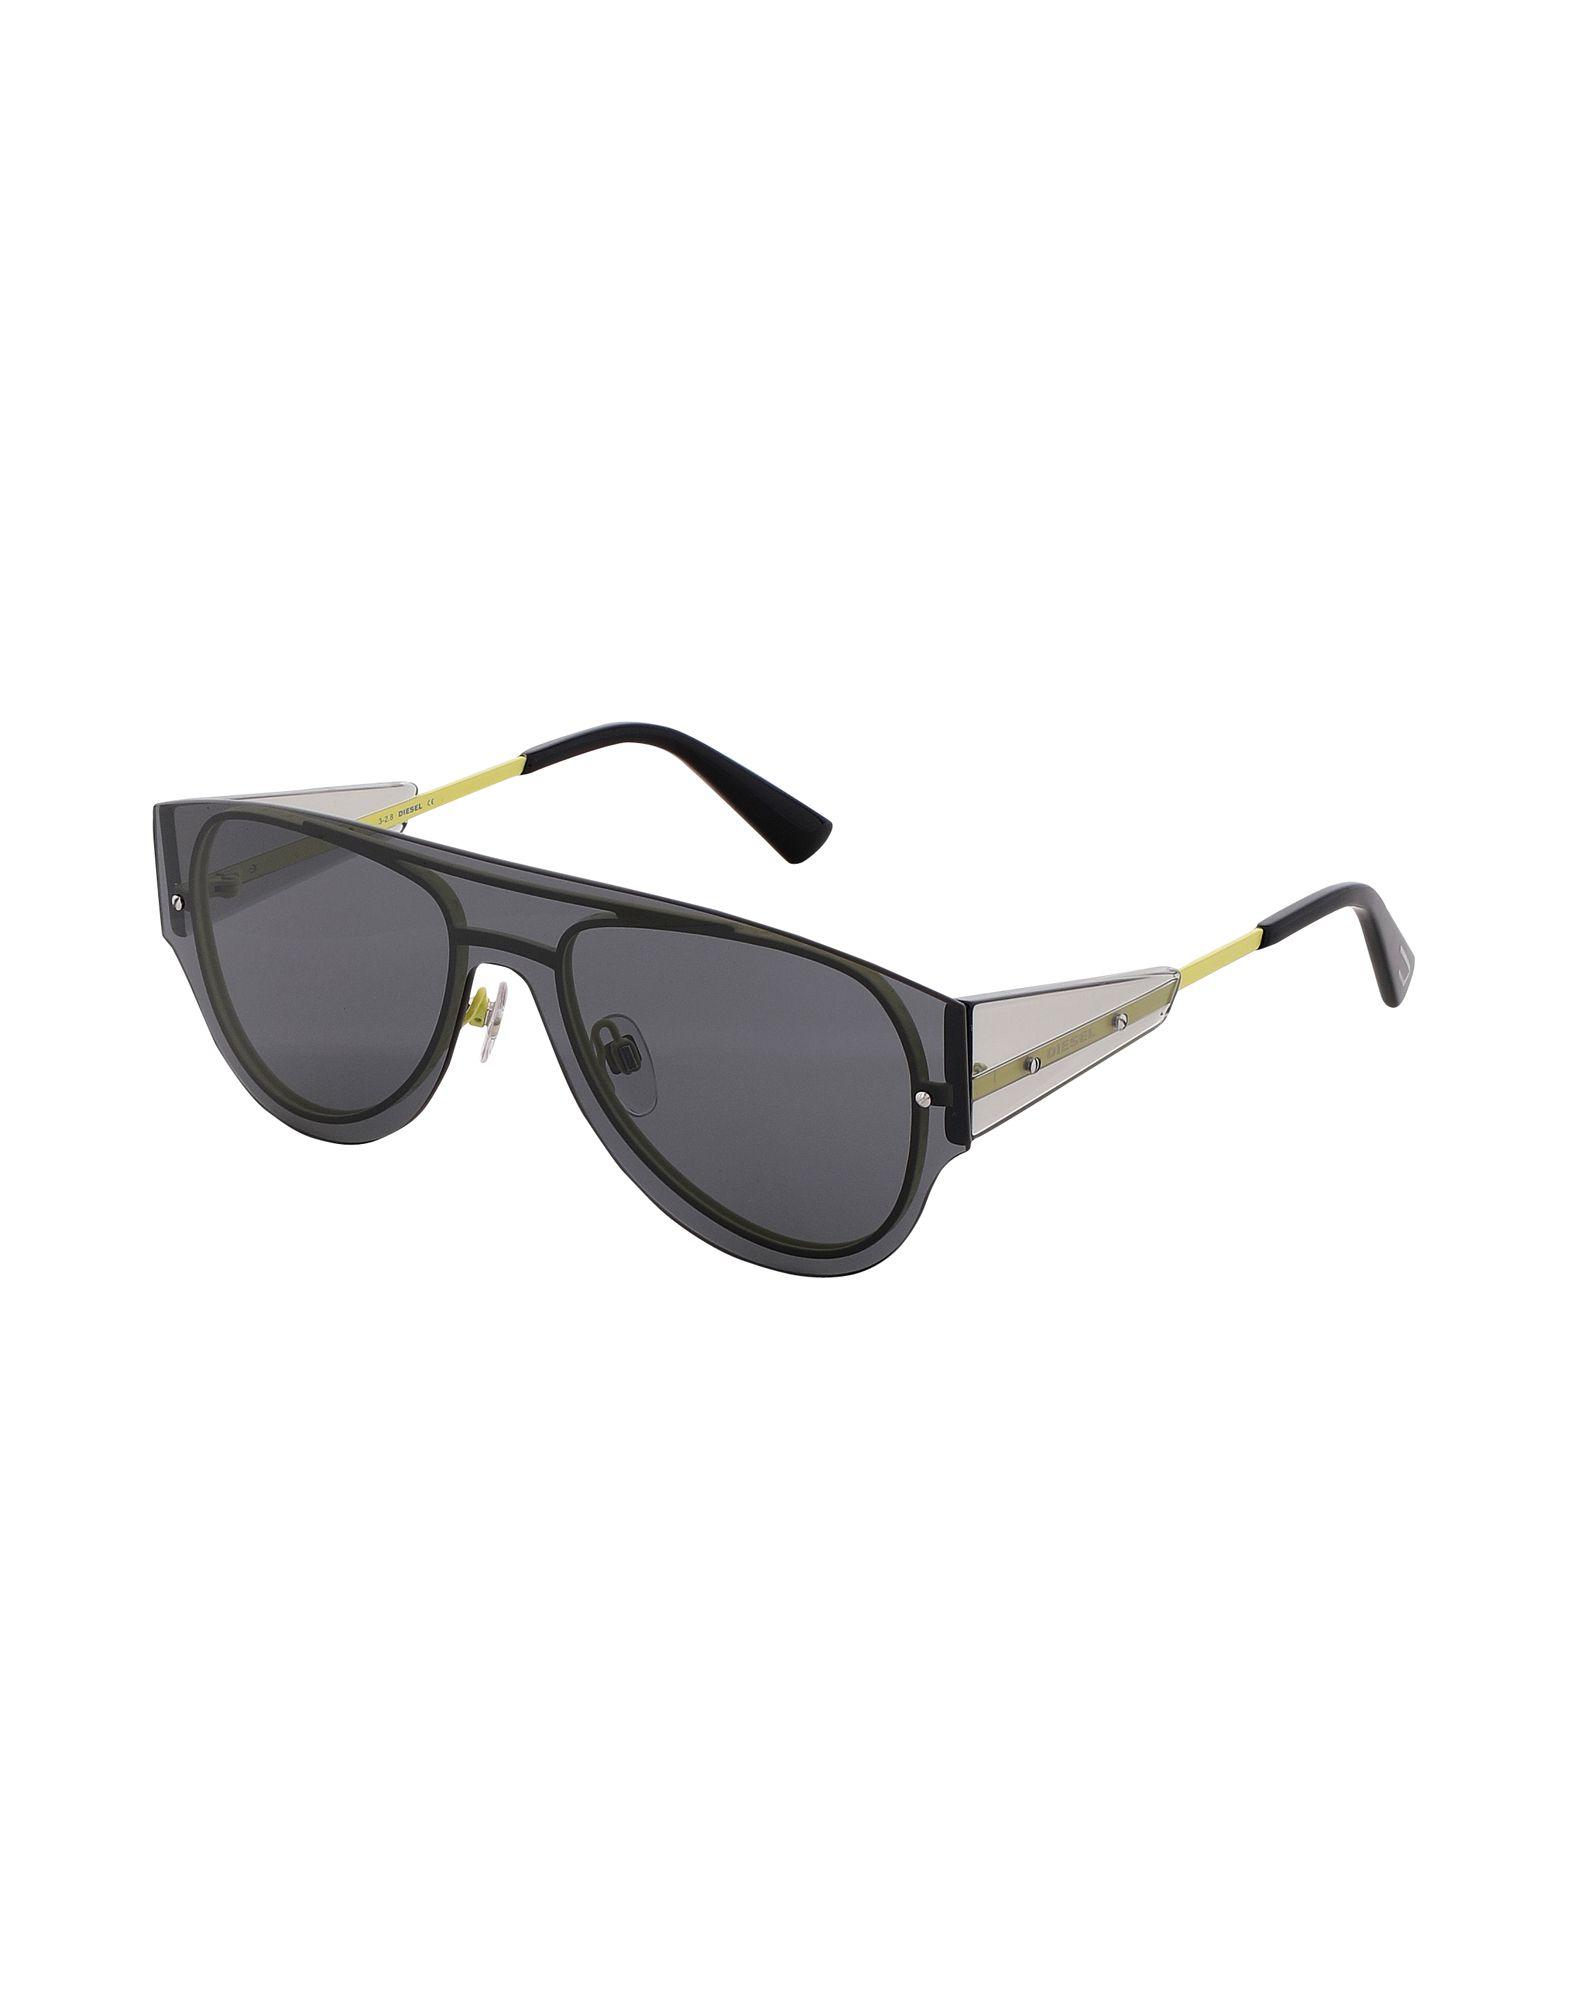 DIESEL Солнечные очки поляризационные очки flying fisherman calcutta yellow amber